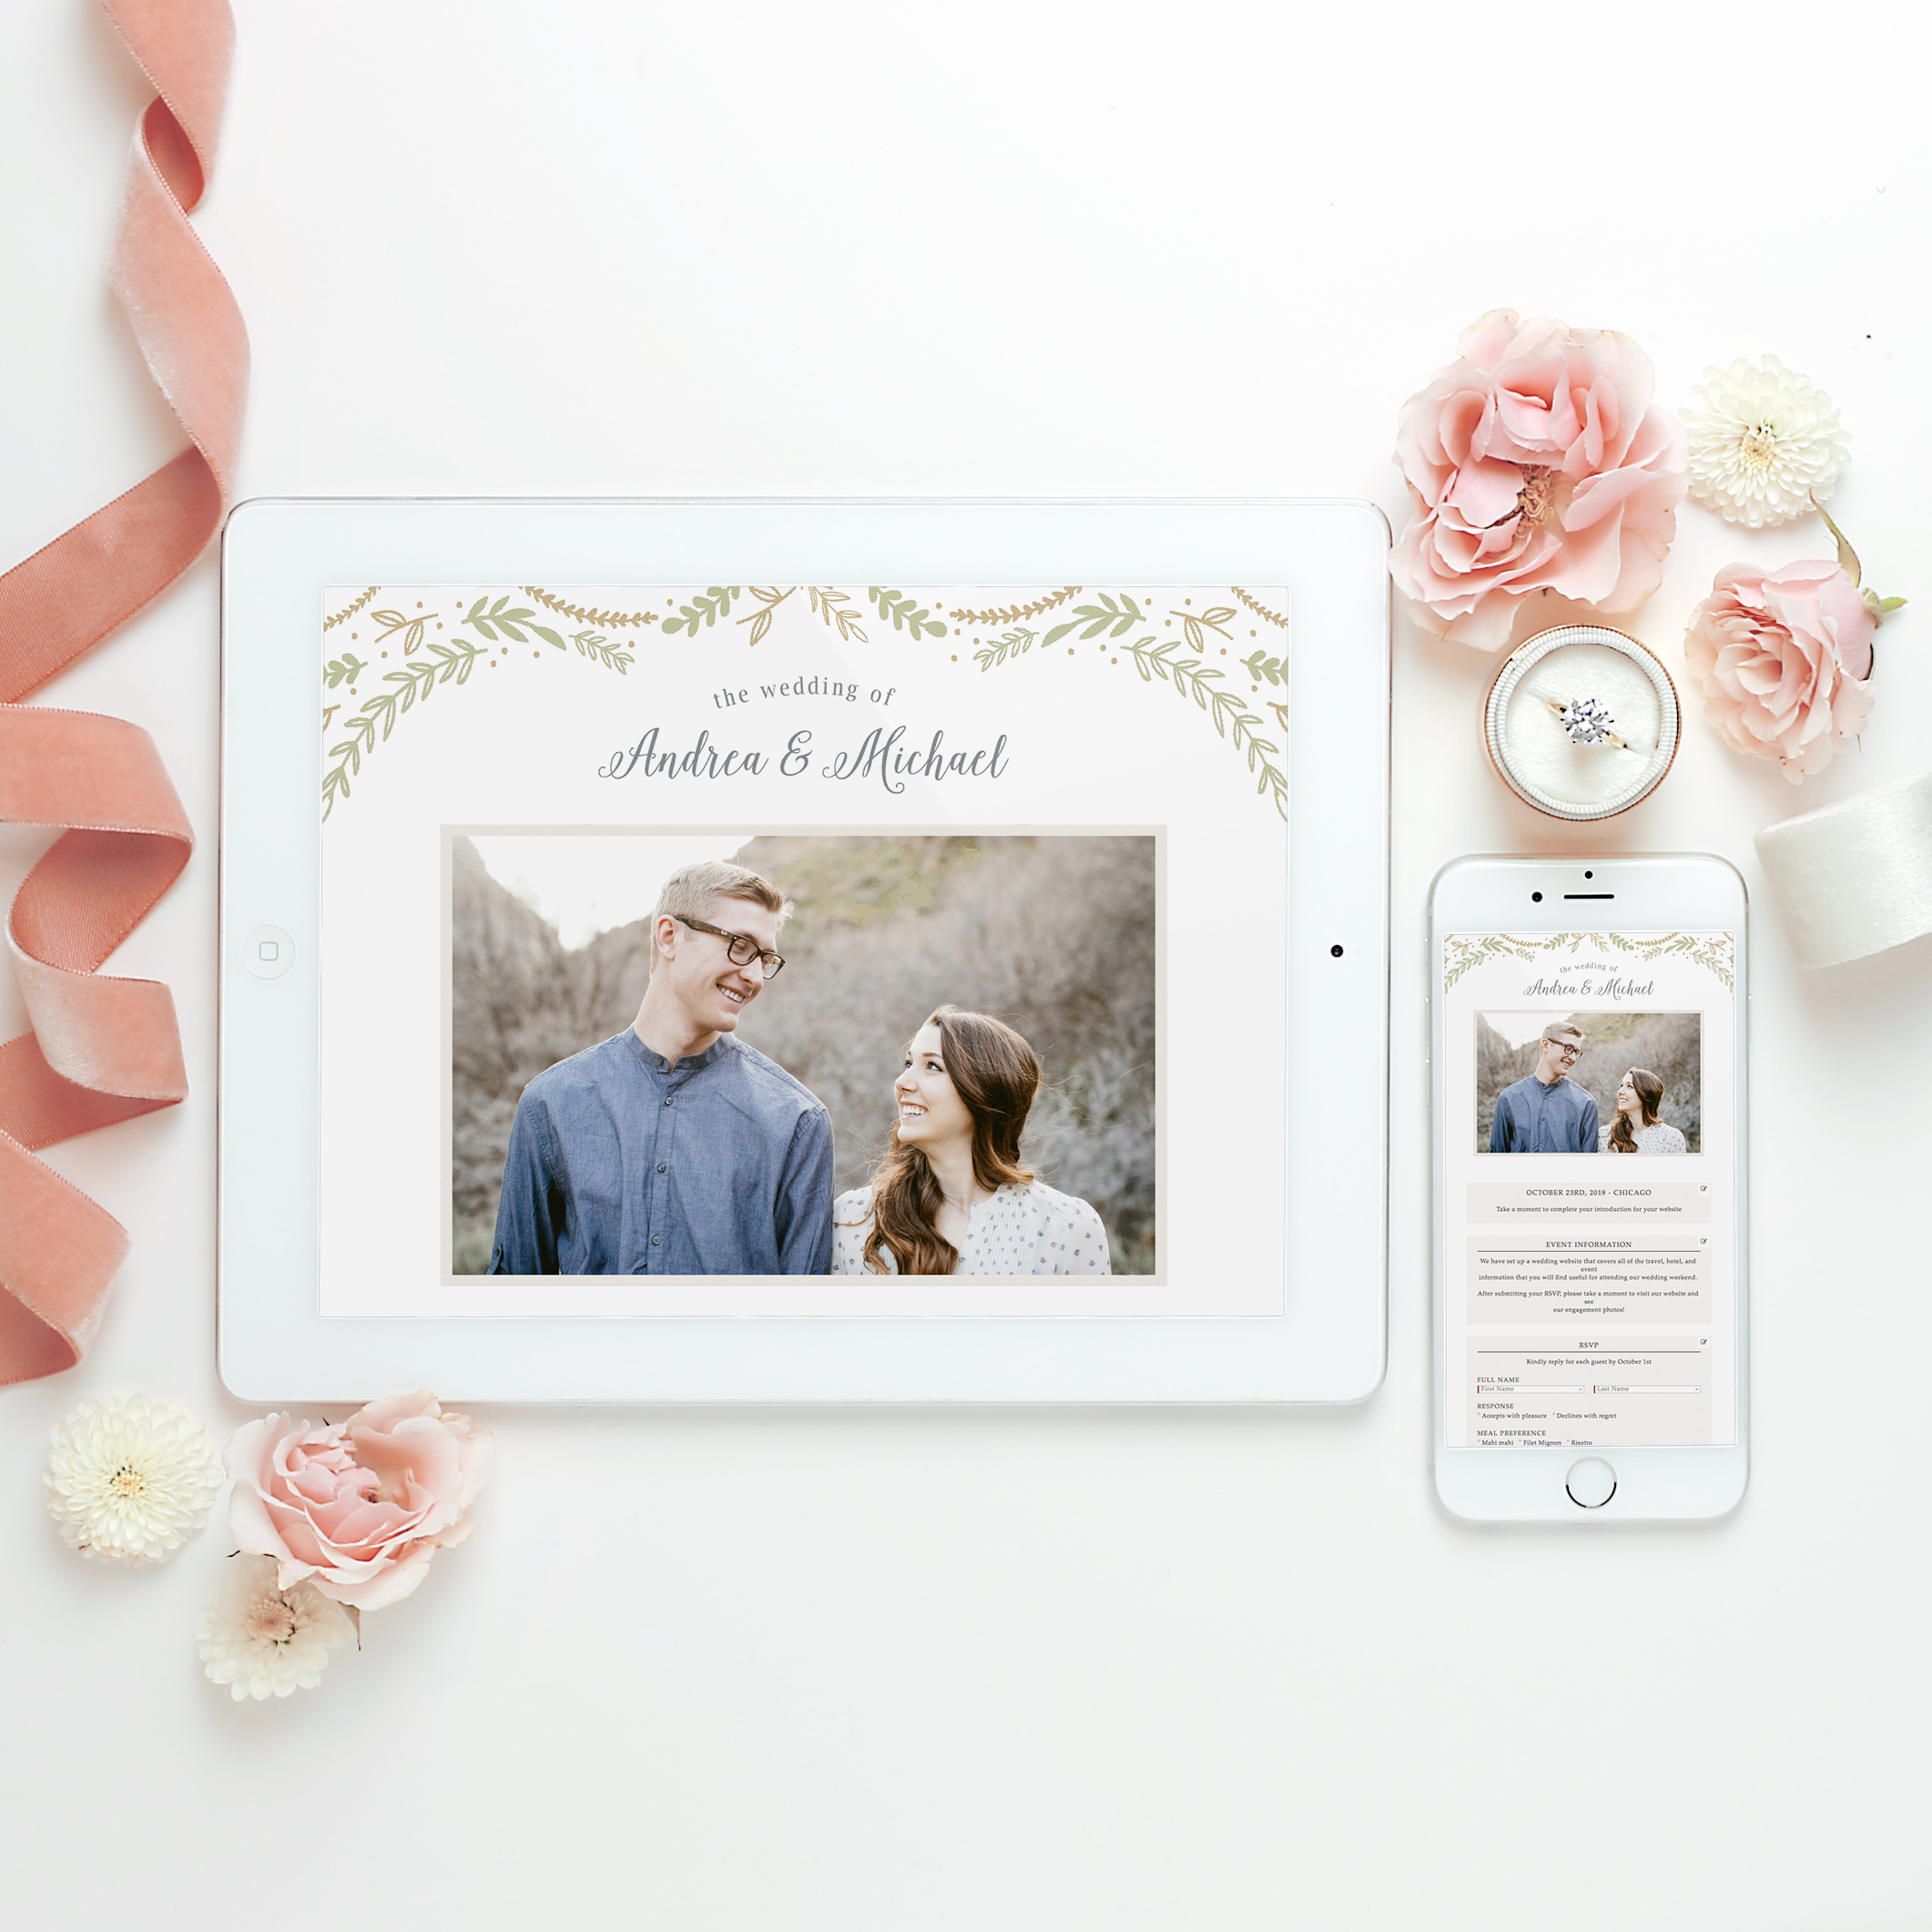 Basic_Invite_Wedding_Suites_15.jpg